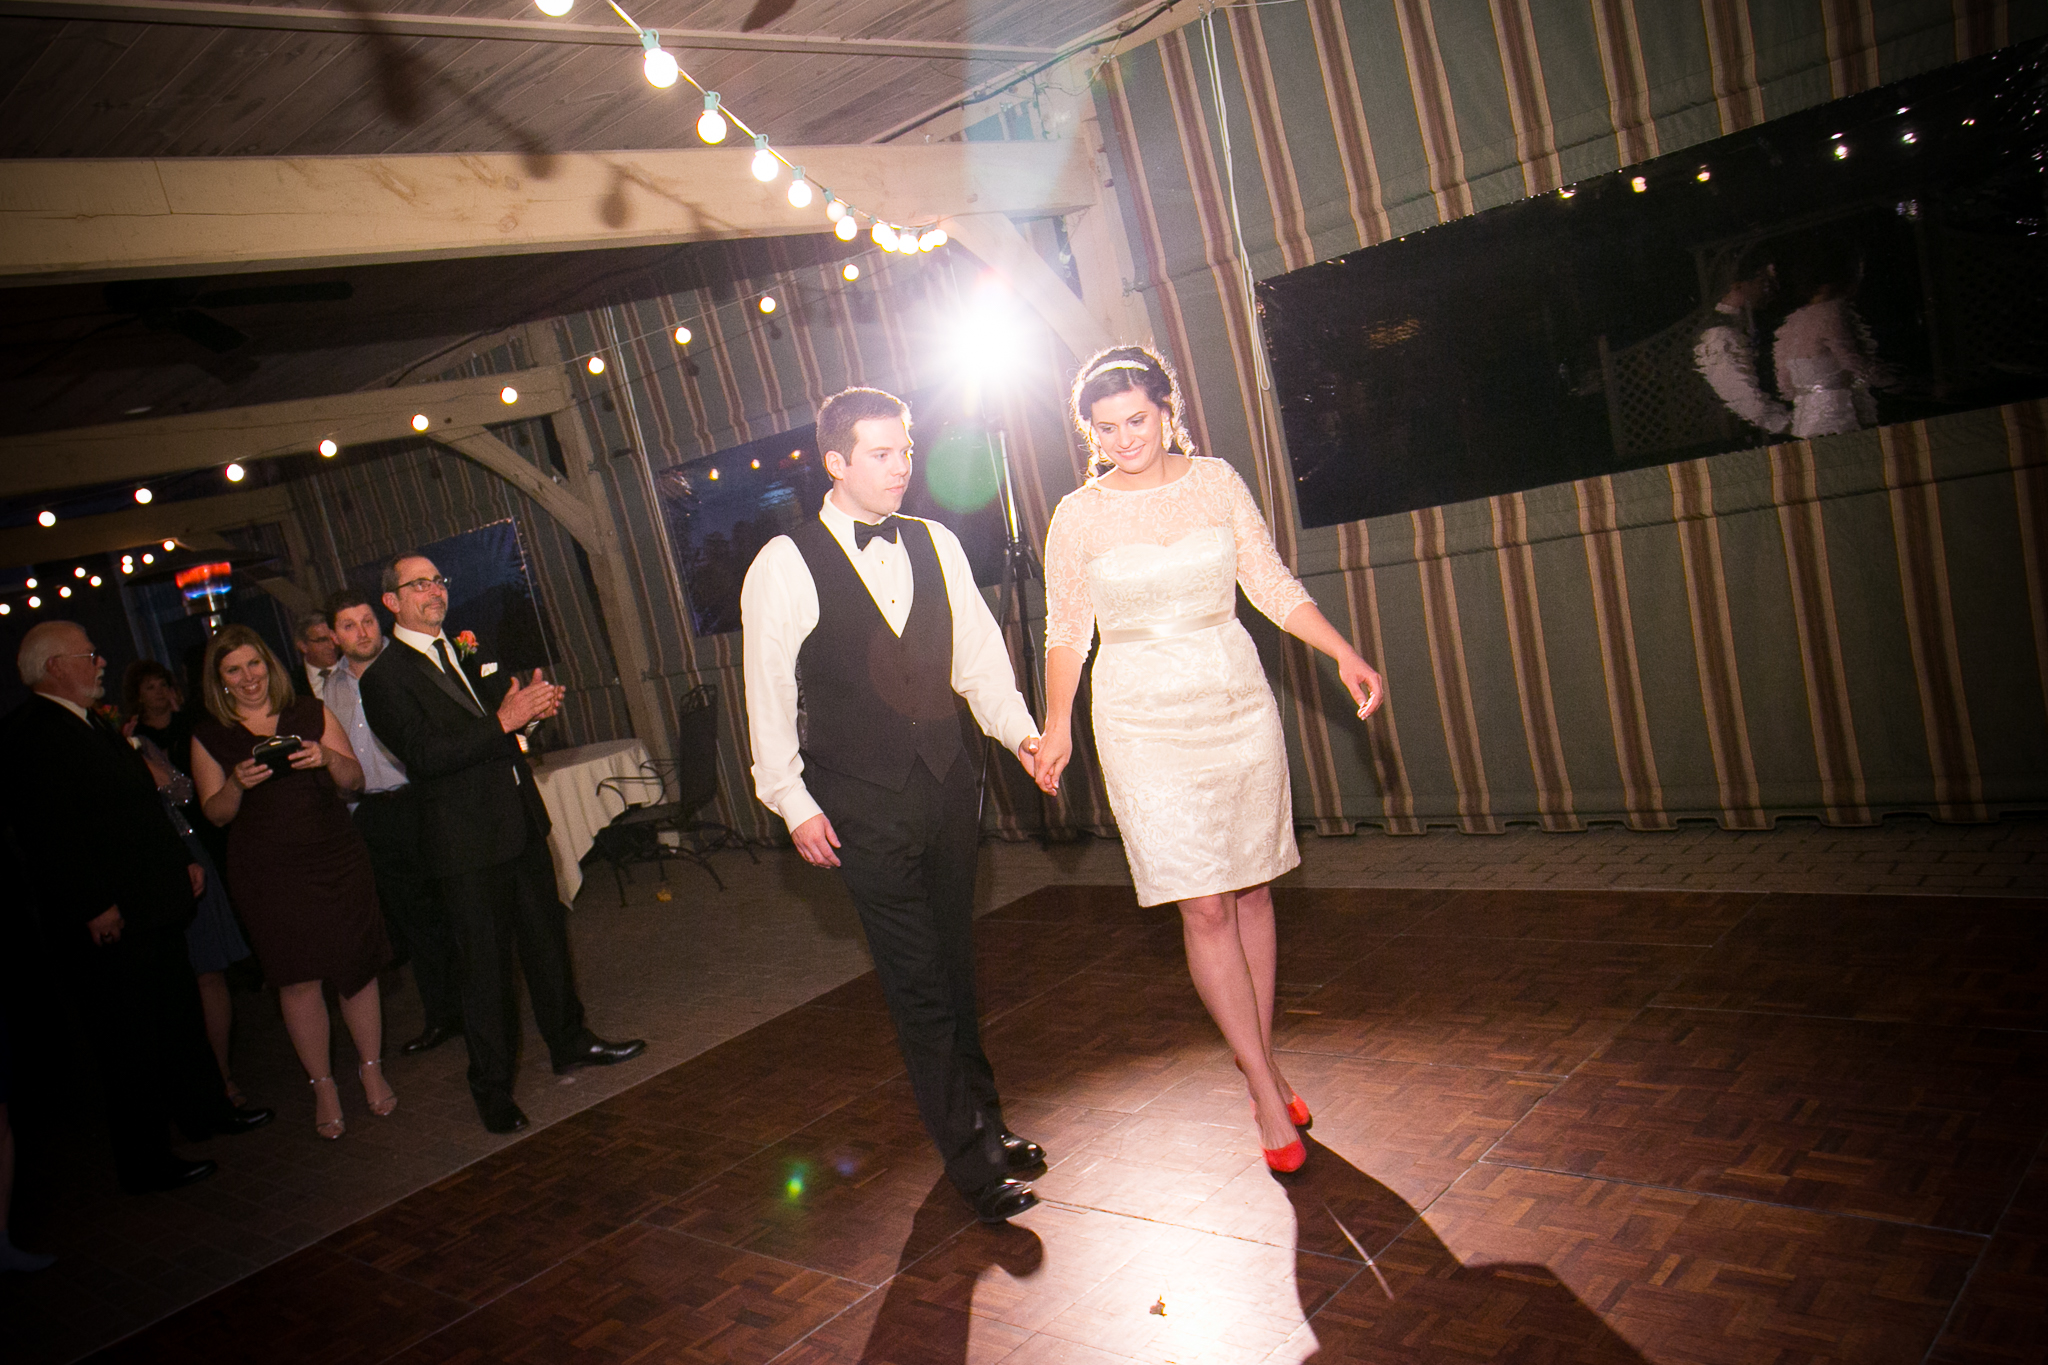 camuglia-whomstudio-chelsea_and_andy-nycphotographer-wedding-brooklyn-buffalo-timberlodge-107-5582.jpg